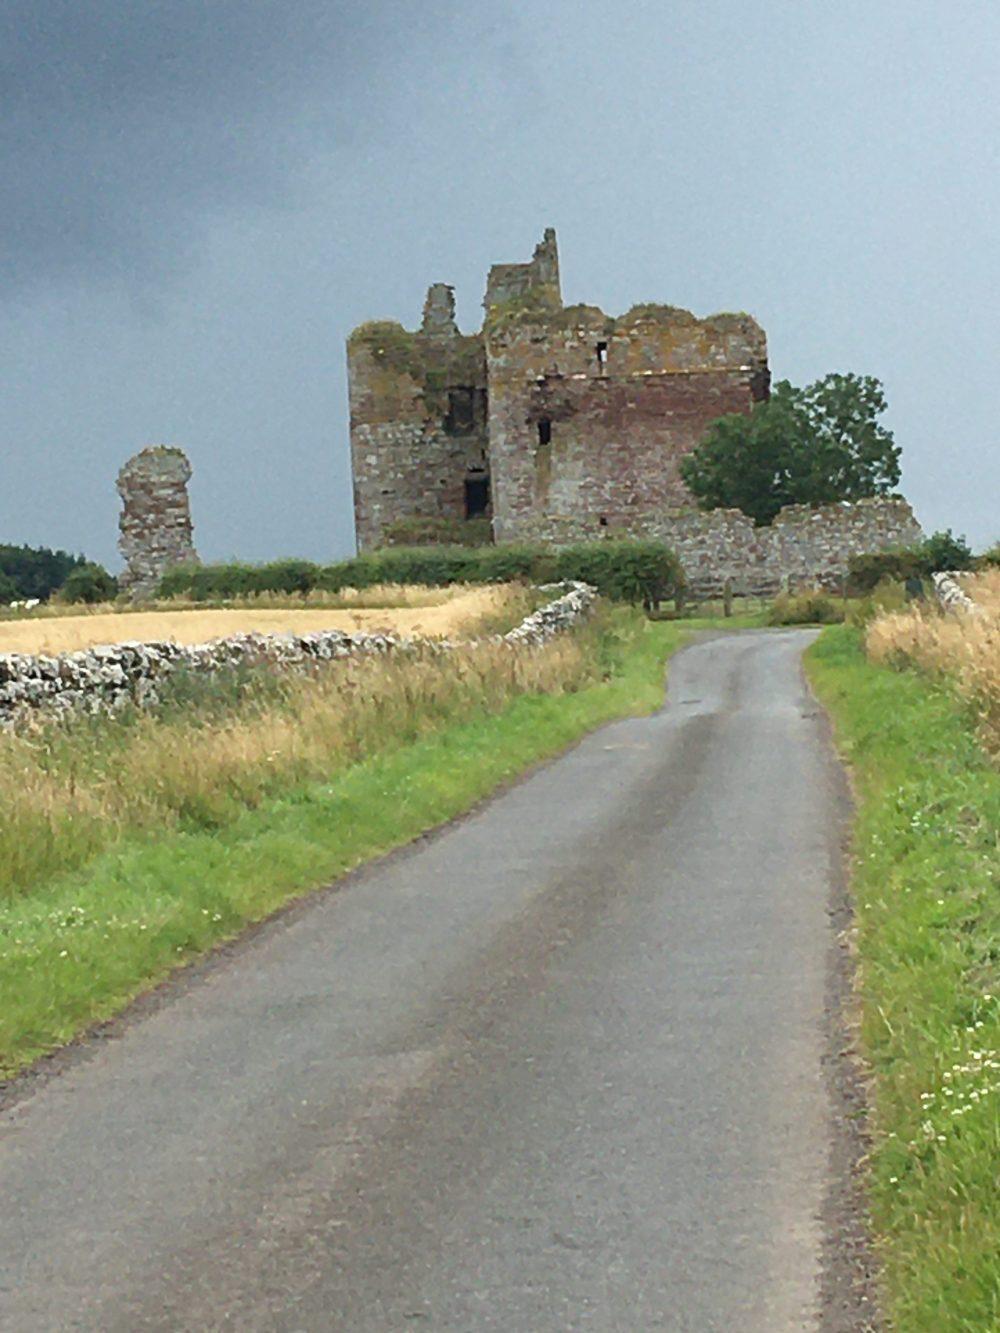 584 Cessfoot Castle